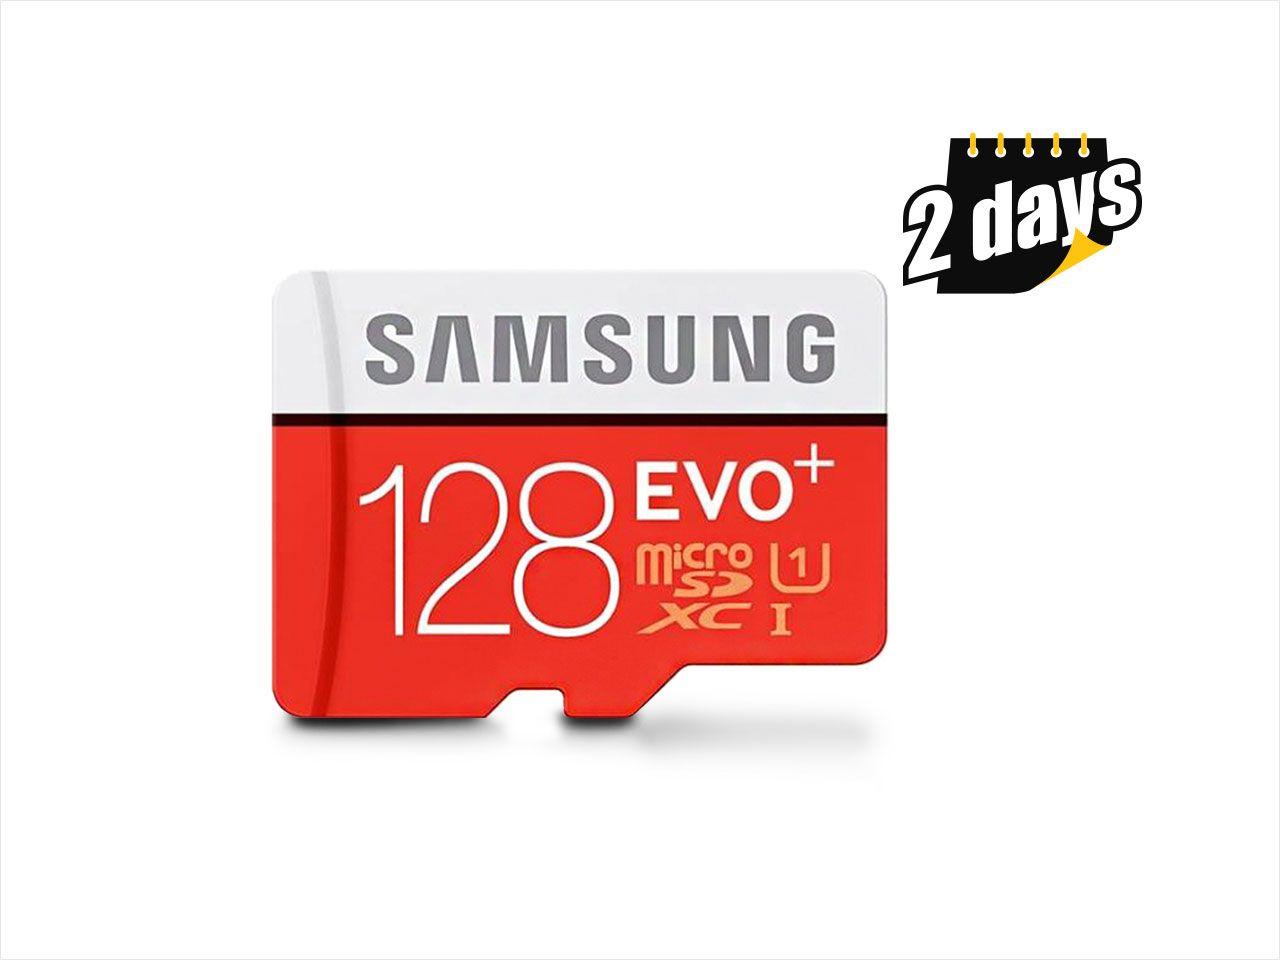 Samsung EVO+ 128GB Class 10 UHS-1 microSDXC $40NF